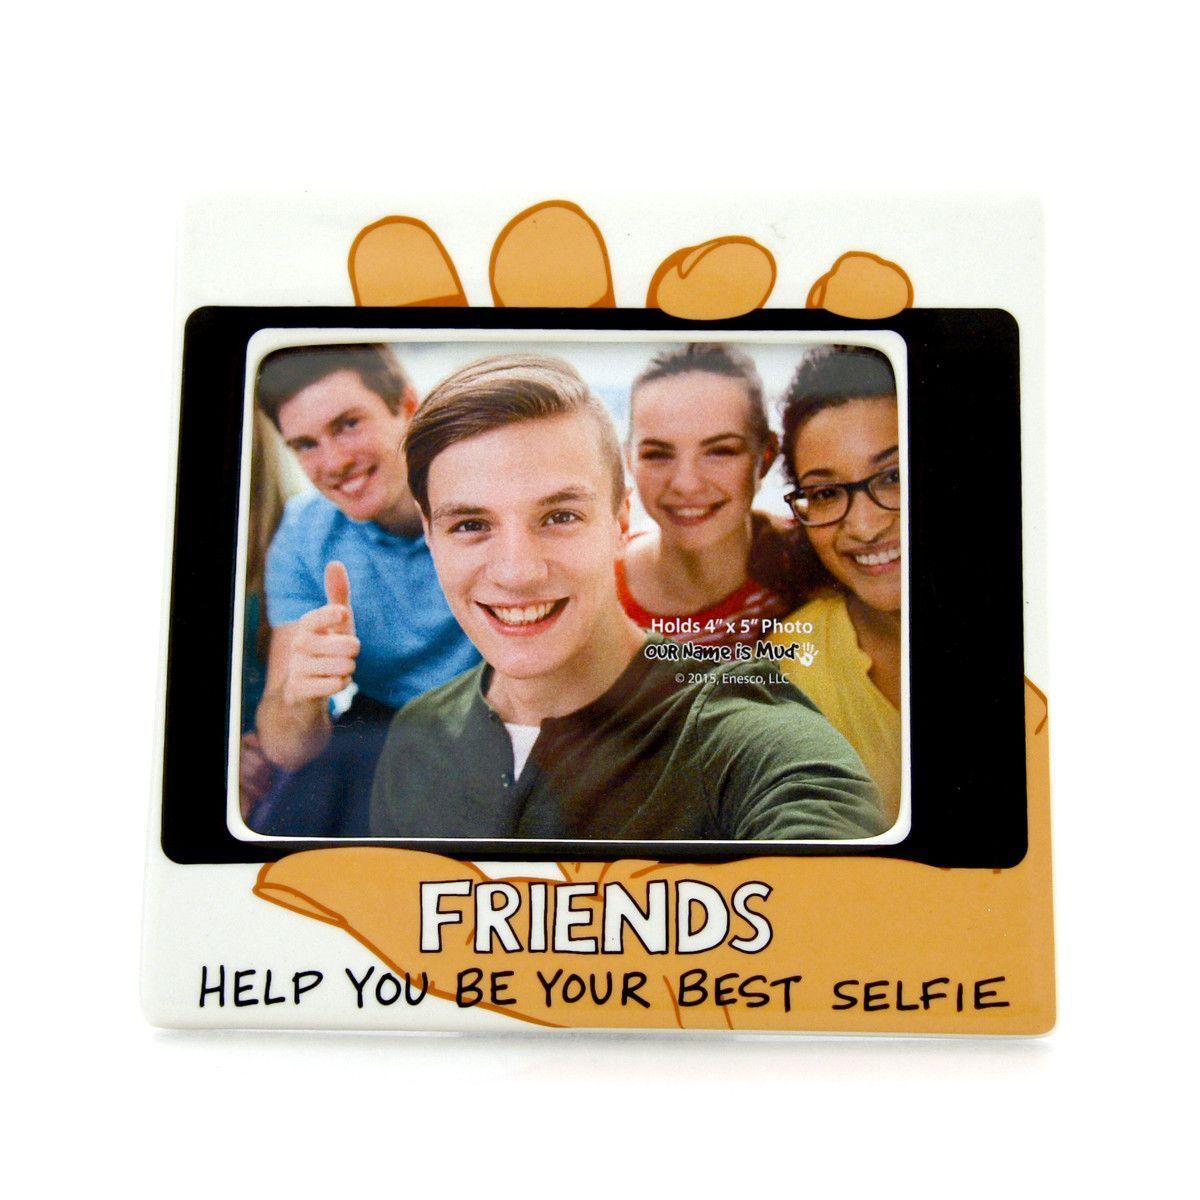 Friends Selfie Frame